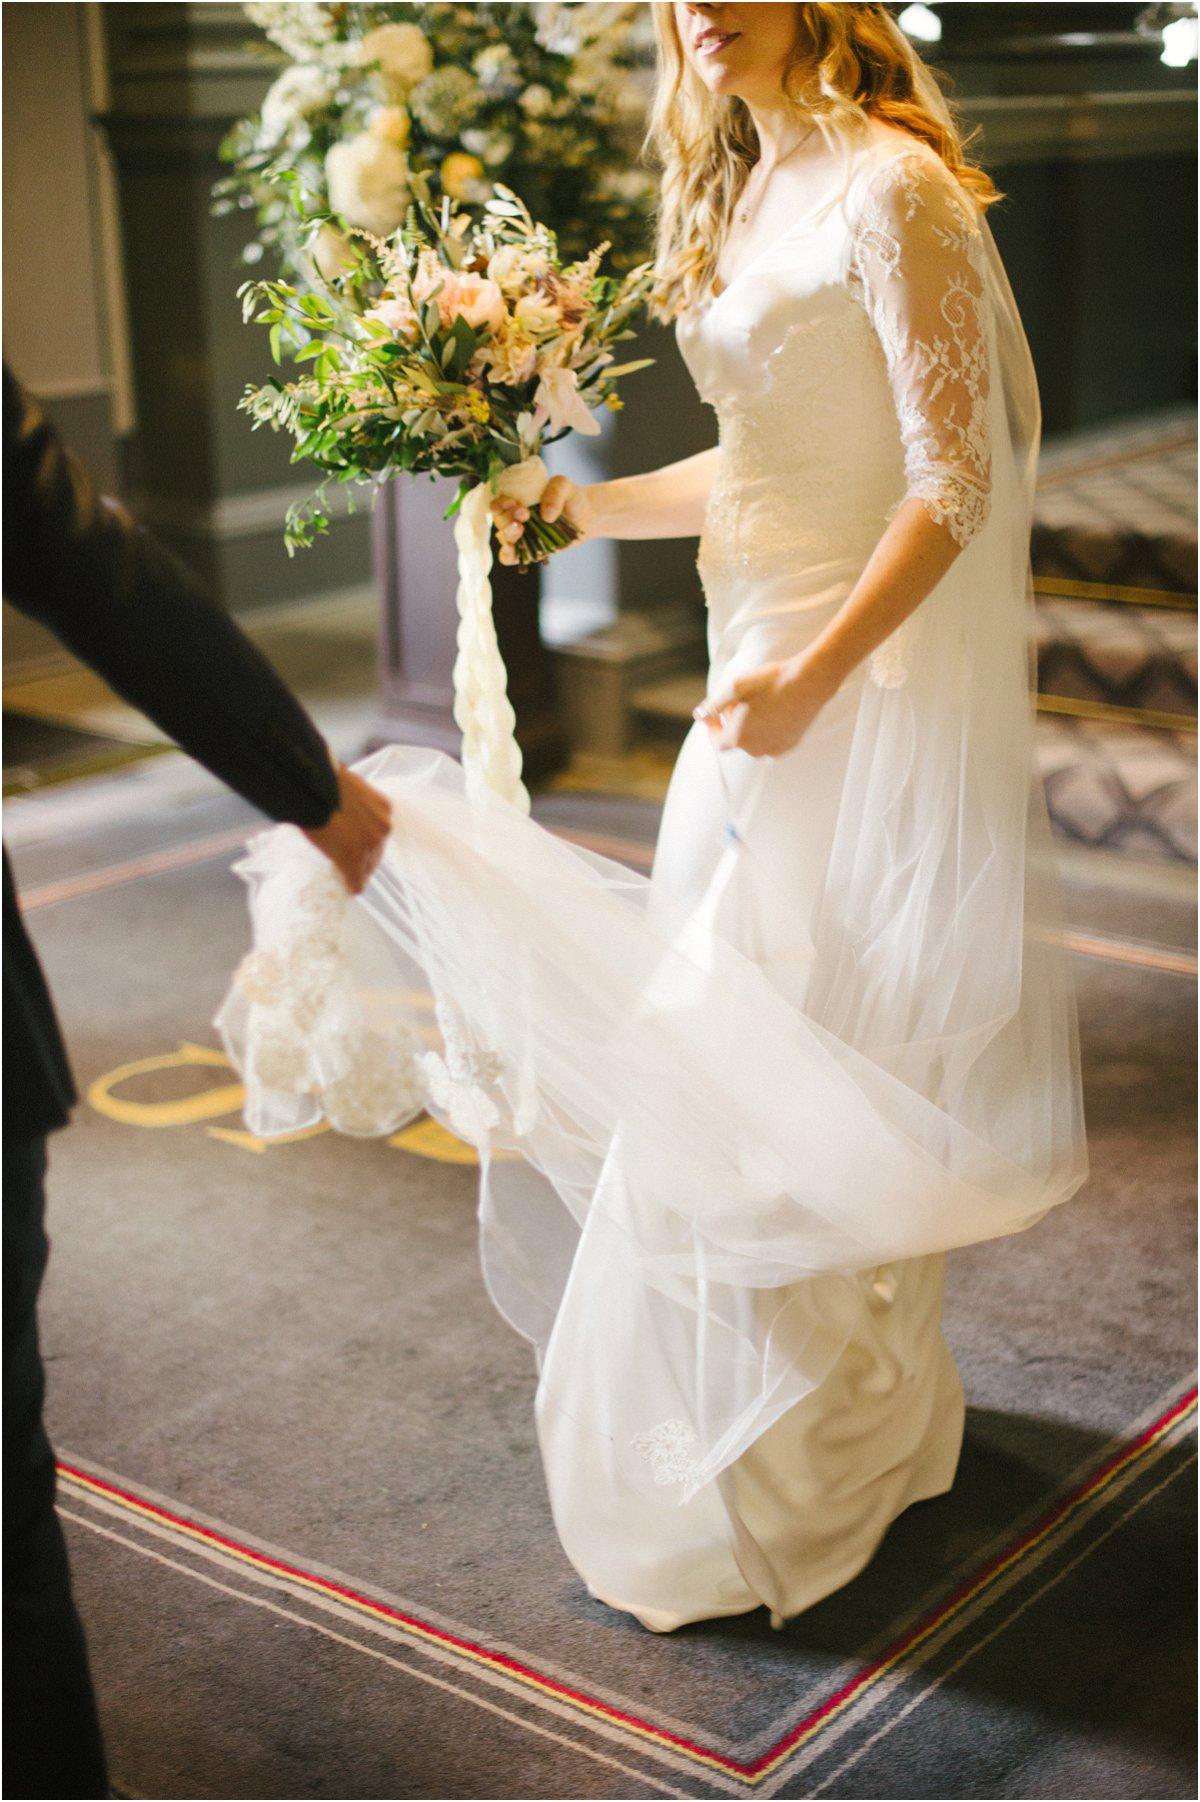 Crofts & Kowalczyk Best Wedding Photography Scotland Blogpost-82.jpg